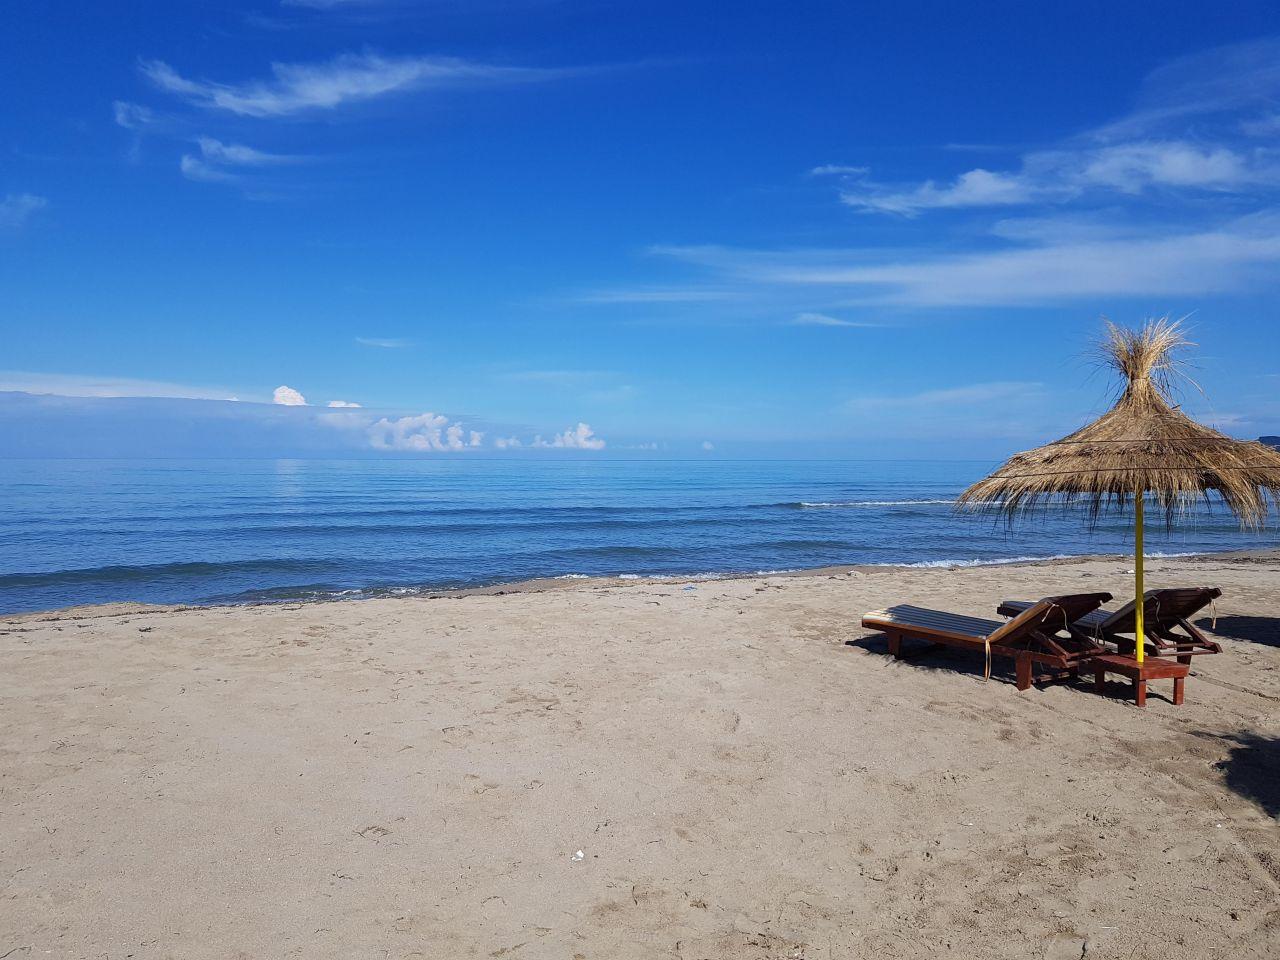 albania apartments for sale at Lura 3 resort Lalzi Bay Albania